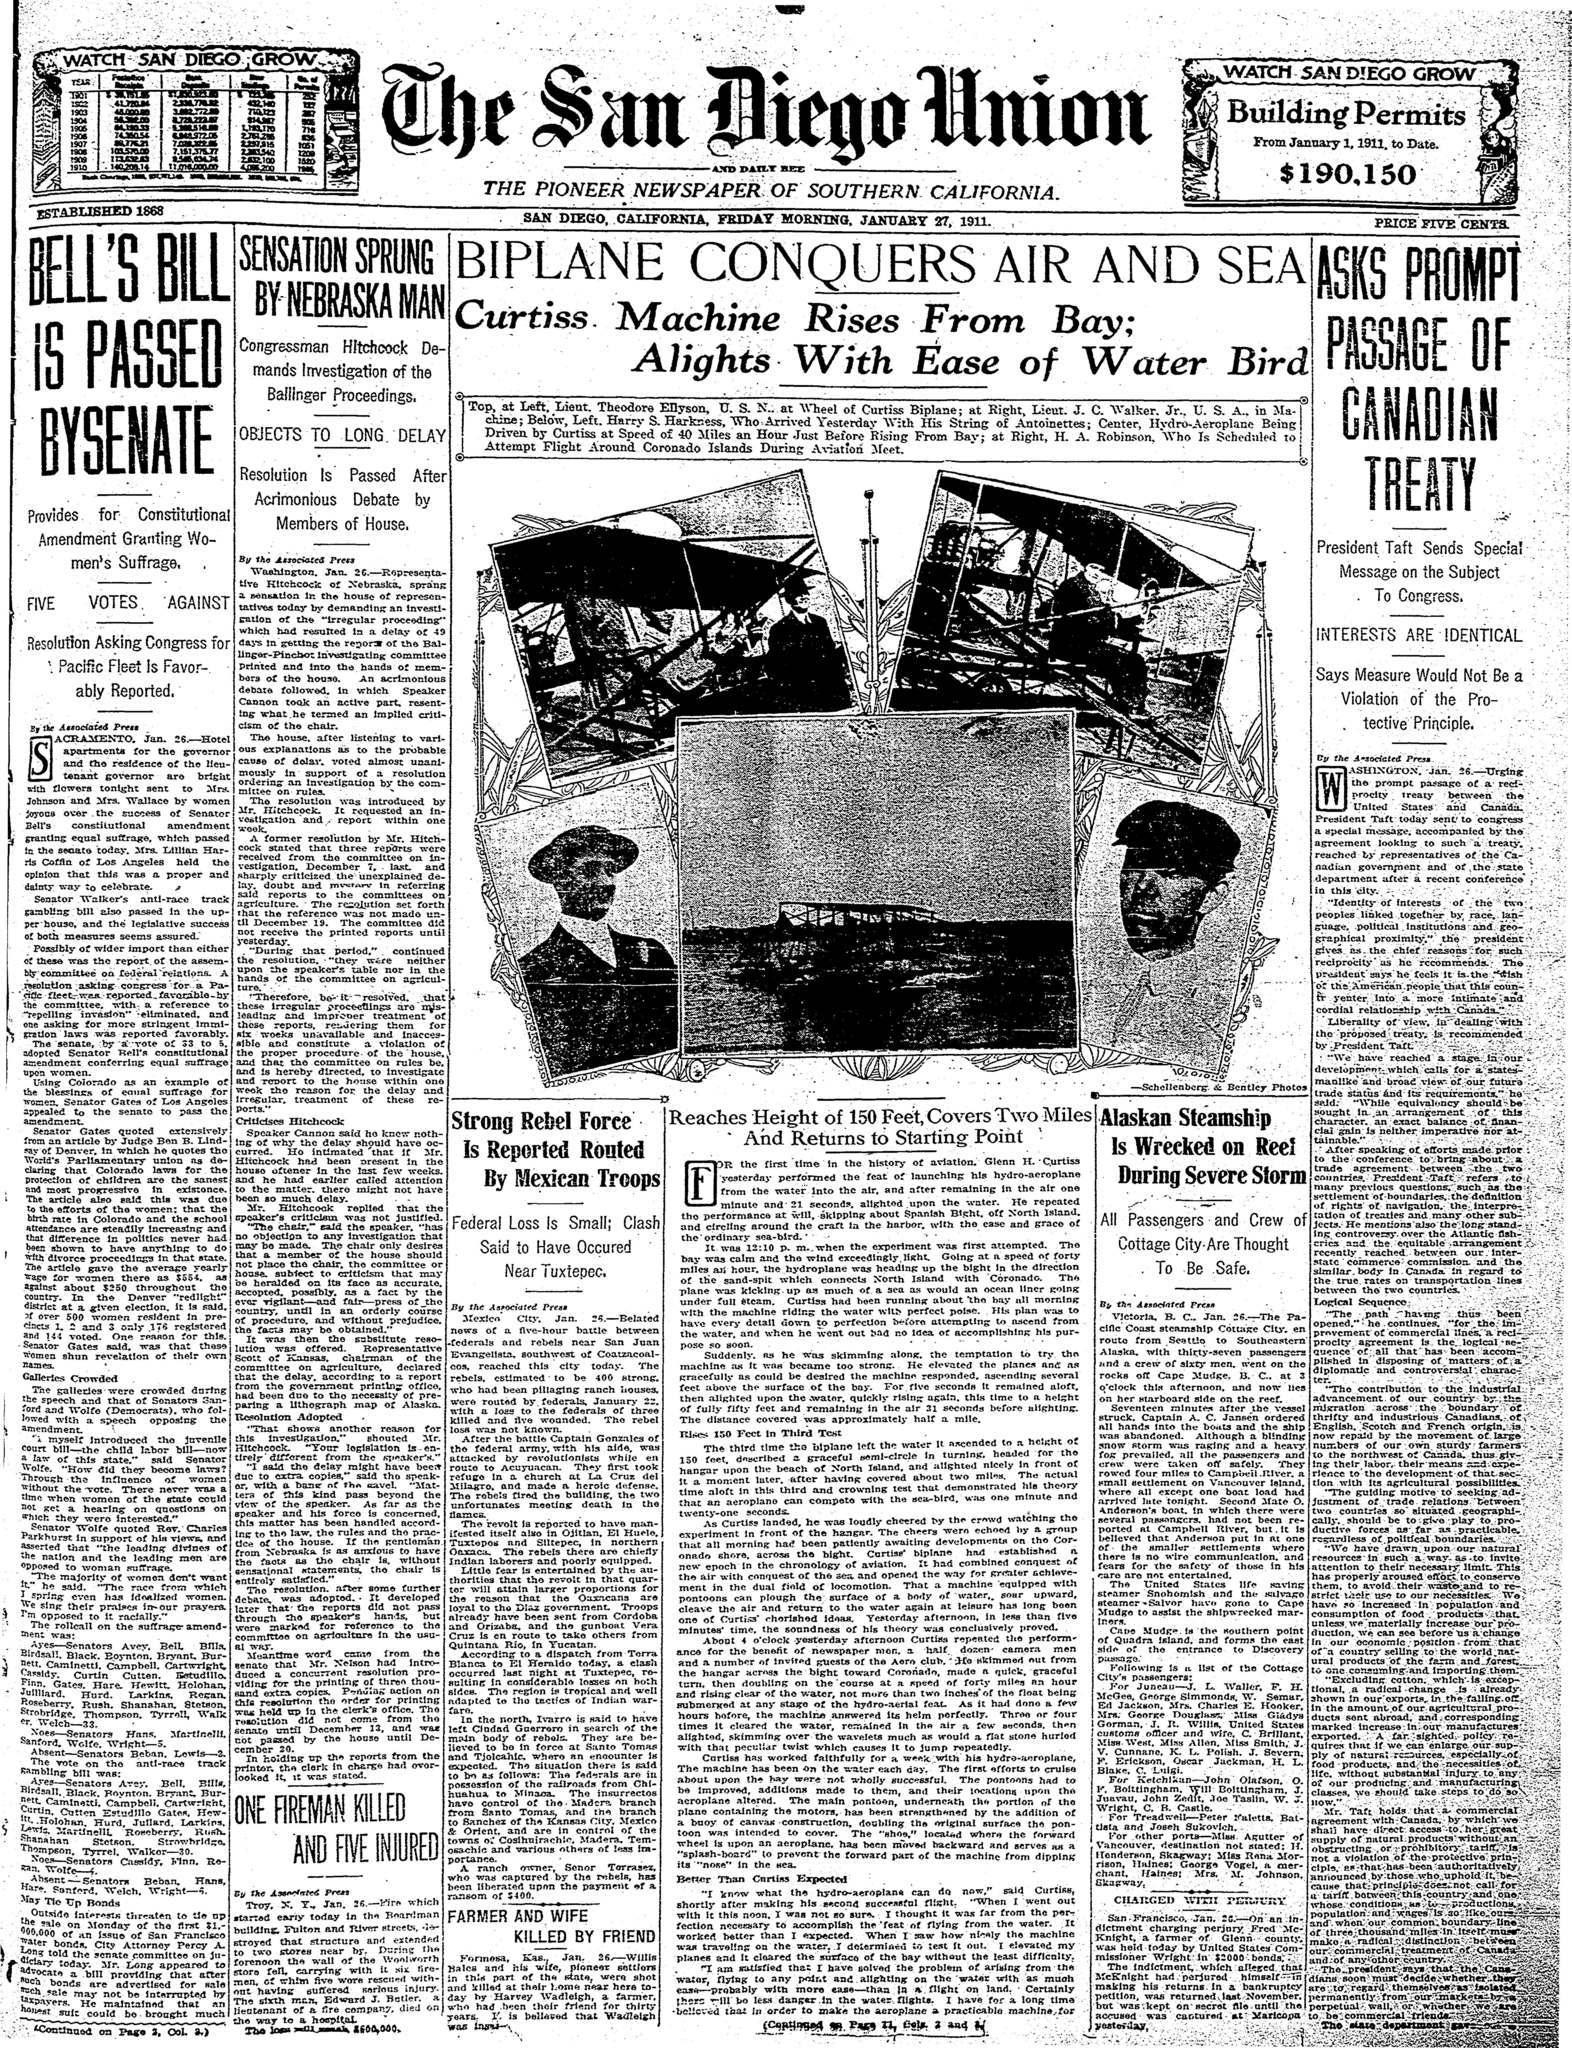 January 27, 1911